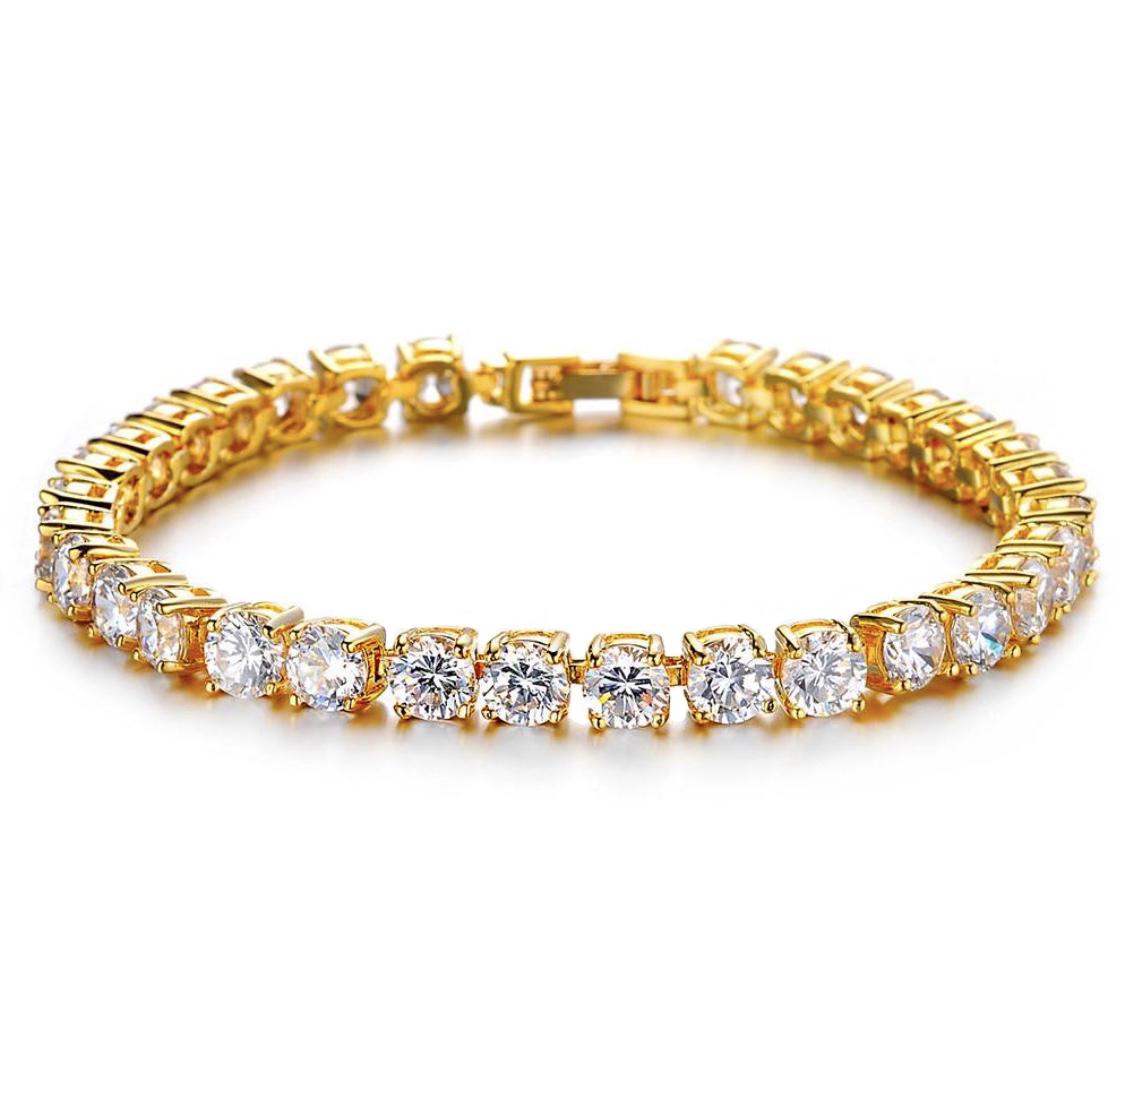 Vvs Tennis Bracelet Flawless Diamonds Shopvvs Wristband Jewelry Bracelets For Men Mens Chain Bracelet